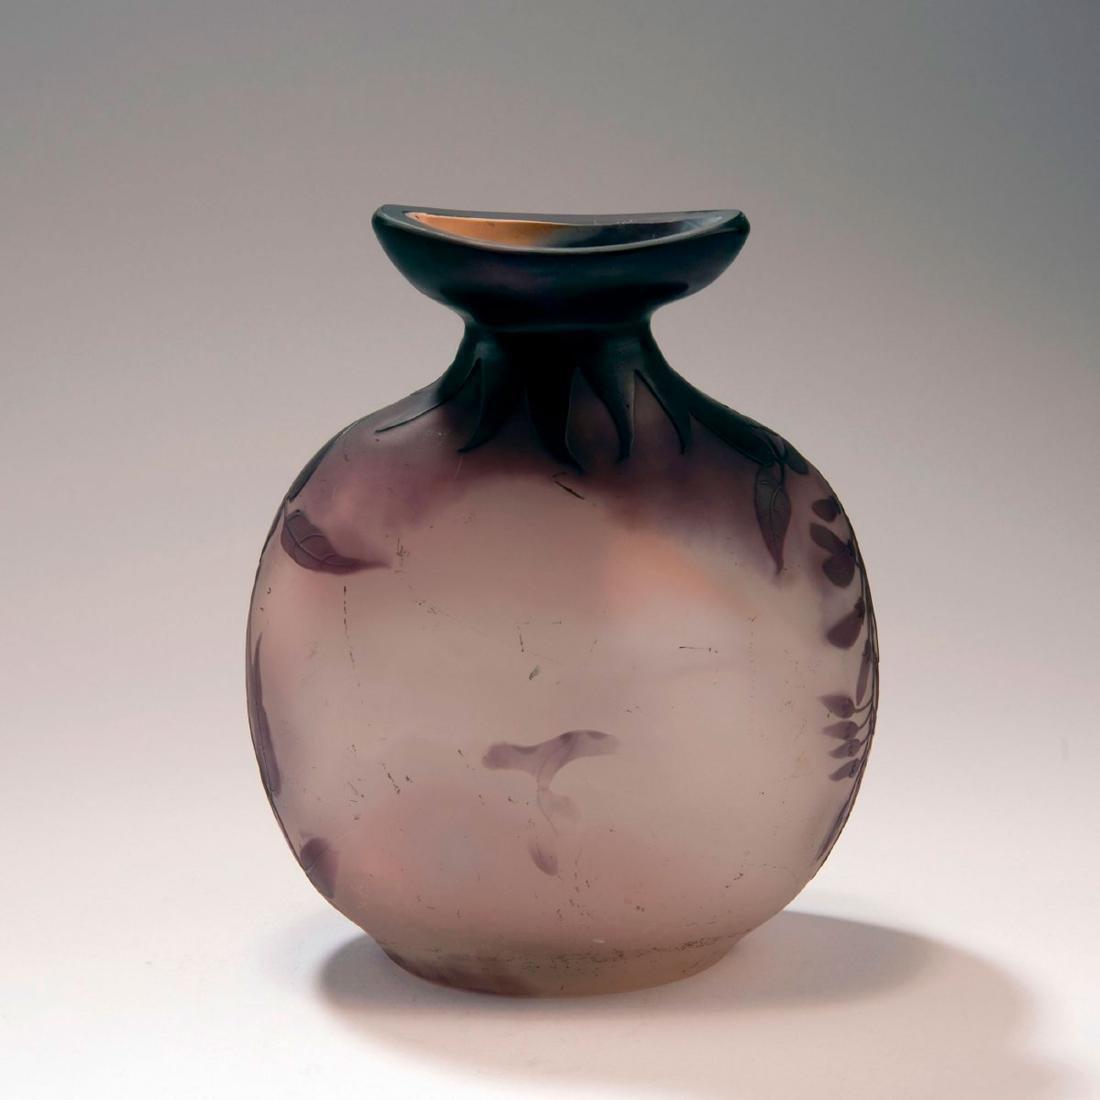 'Glycines' vase, 1902-04 - 2